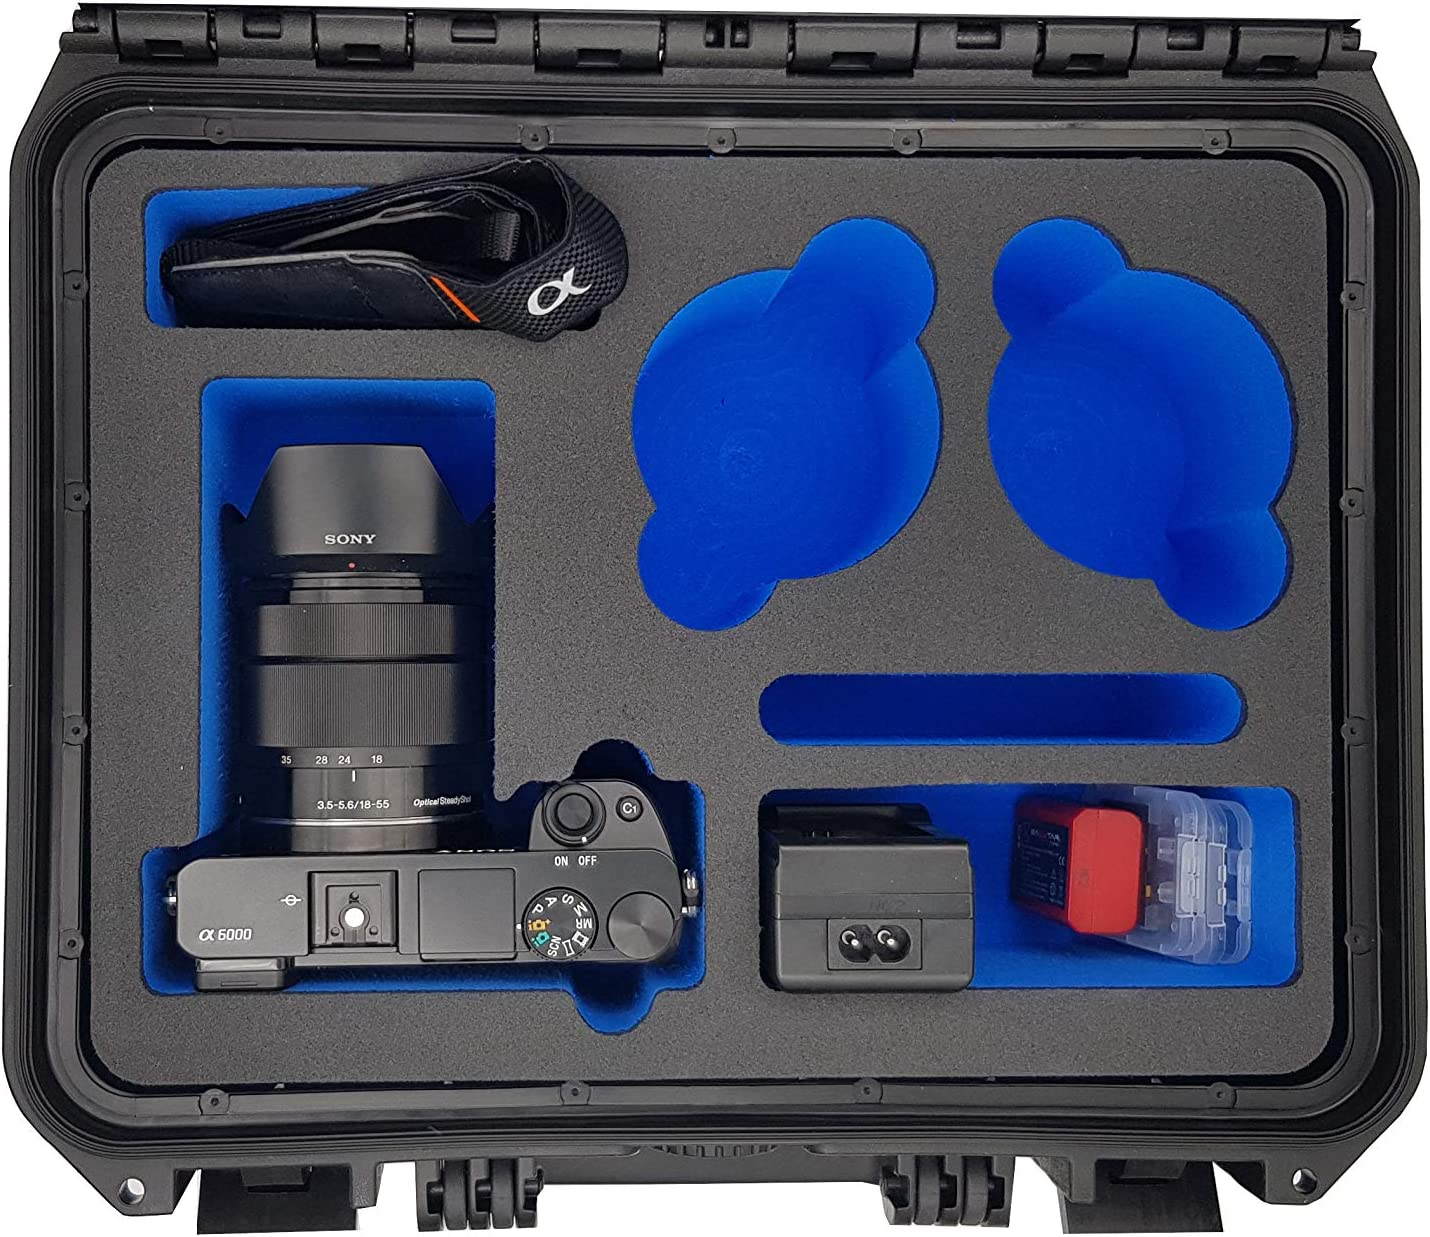 Sony Alpha 6000 Travel Case Storage Ip67 Camera Photo